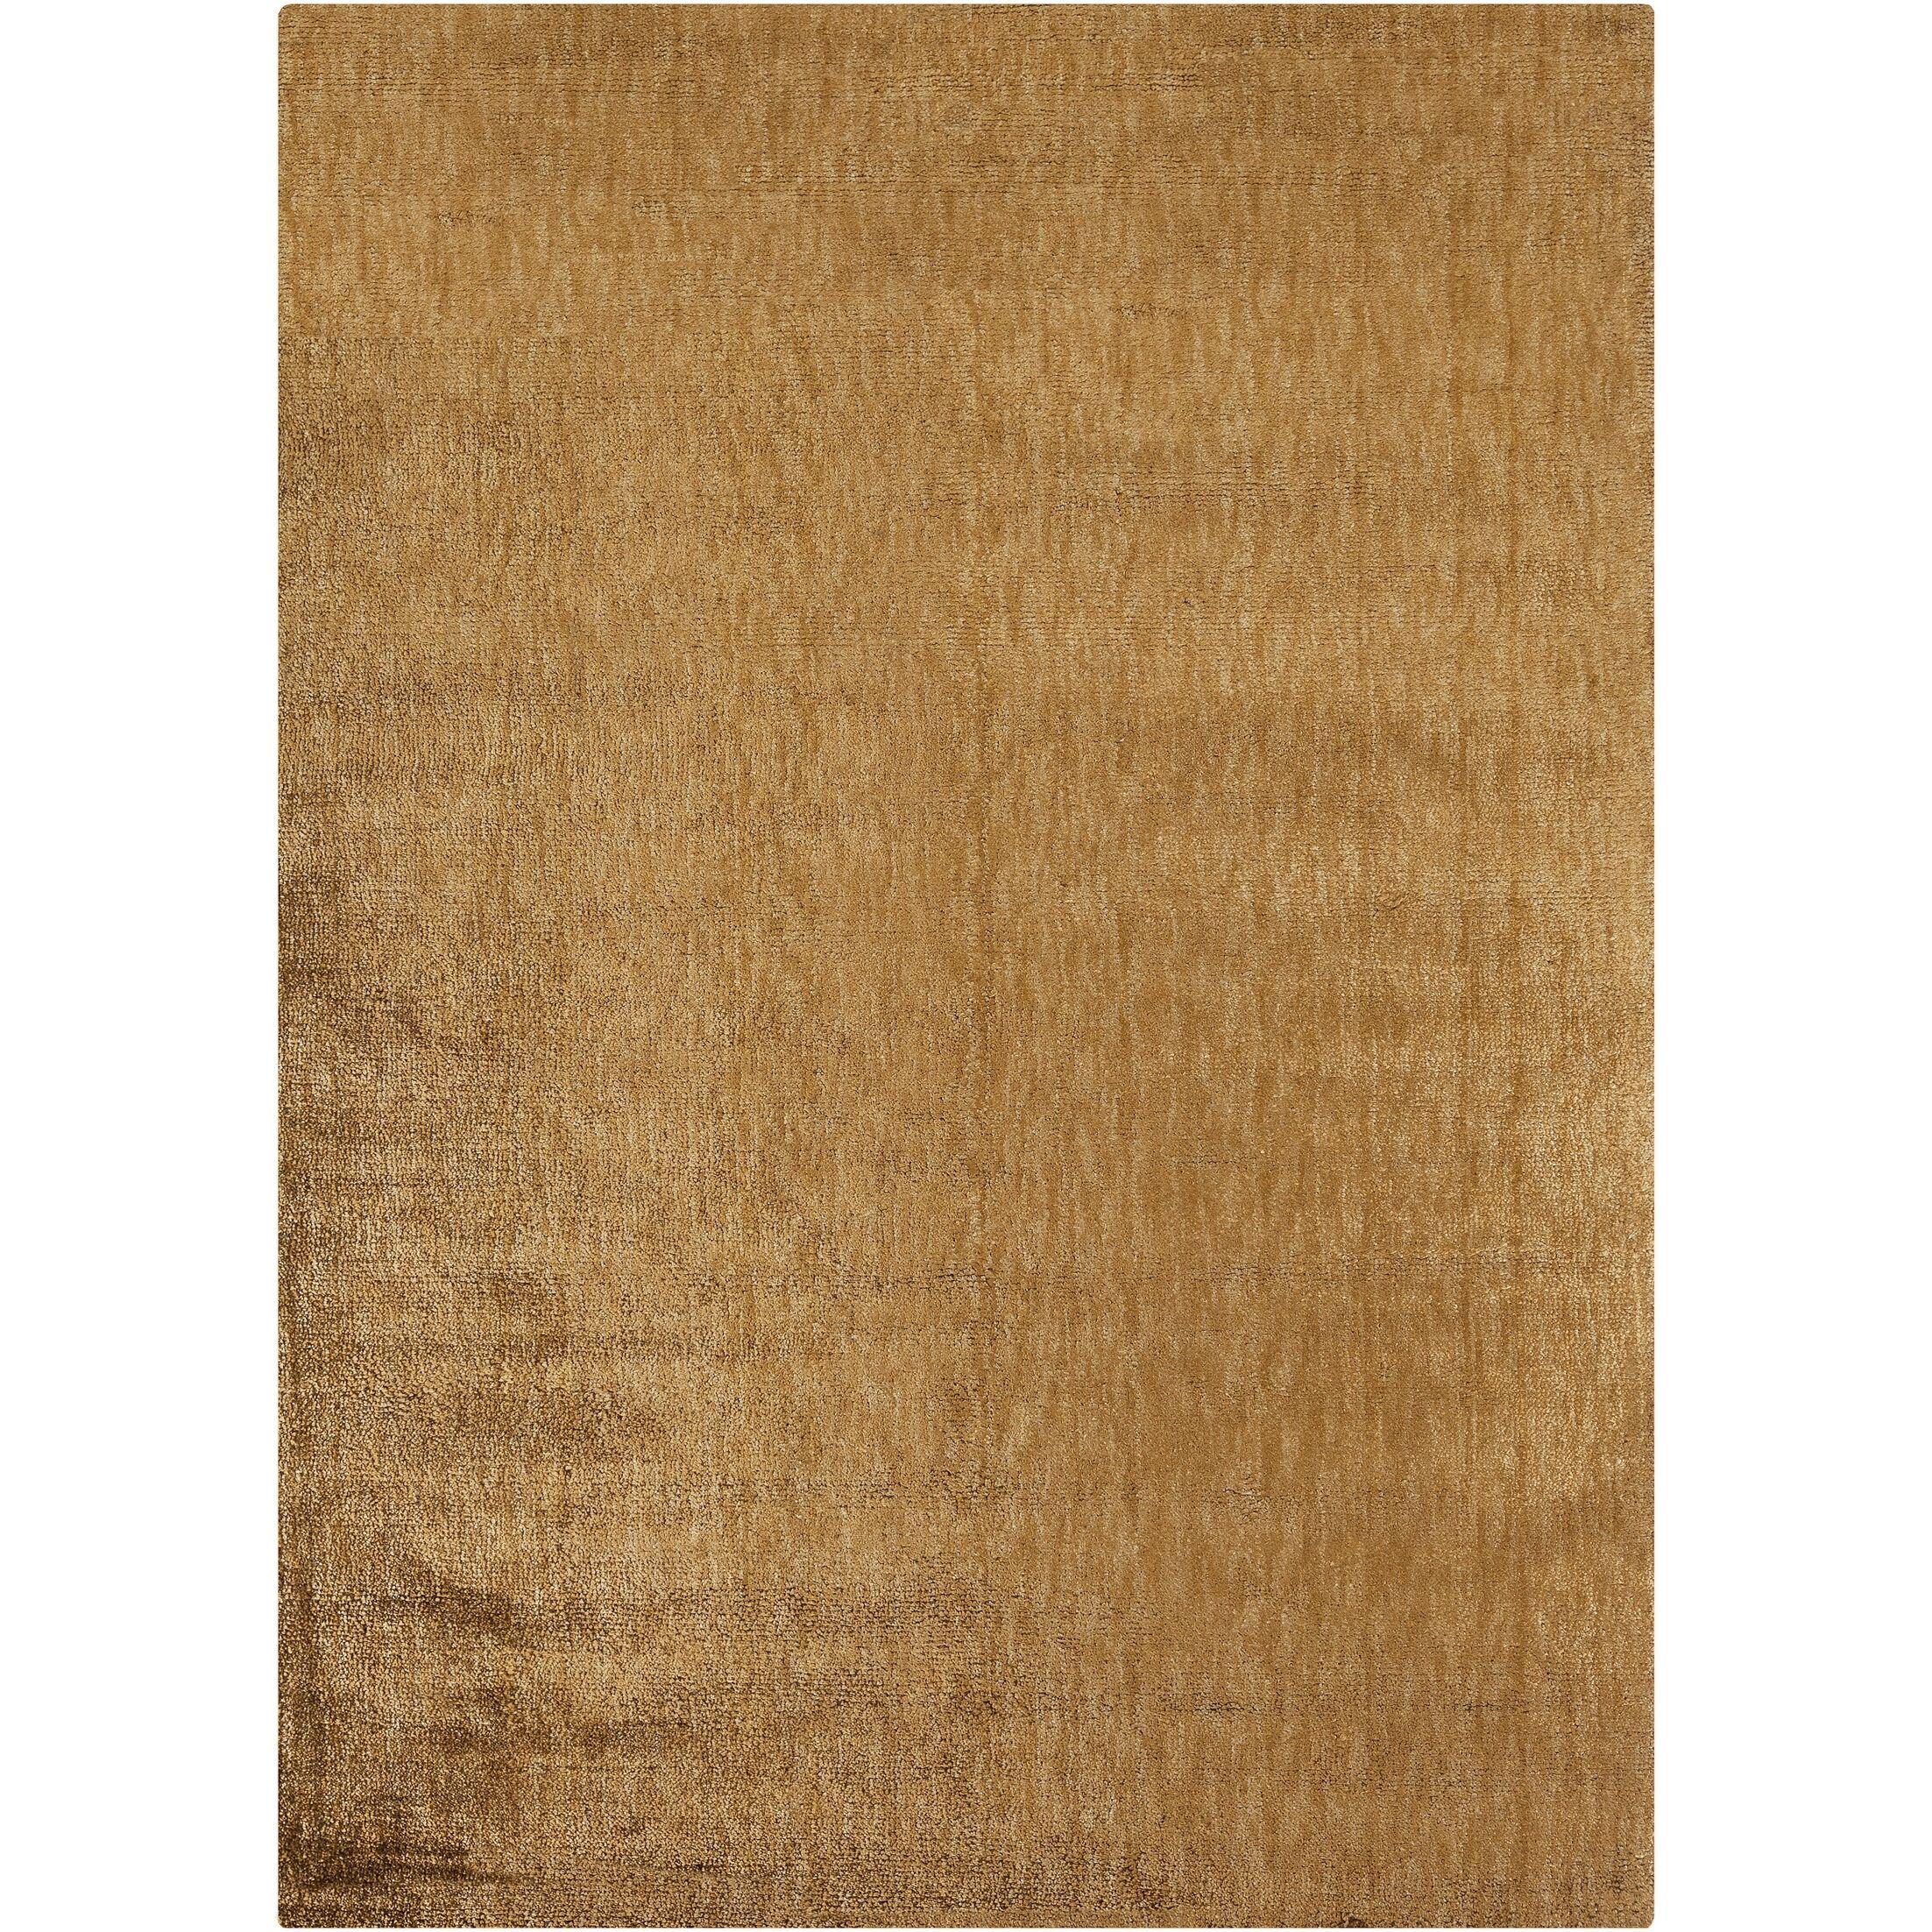 Jamison Brown Area Rug Rug Size: 7' x 10'